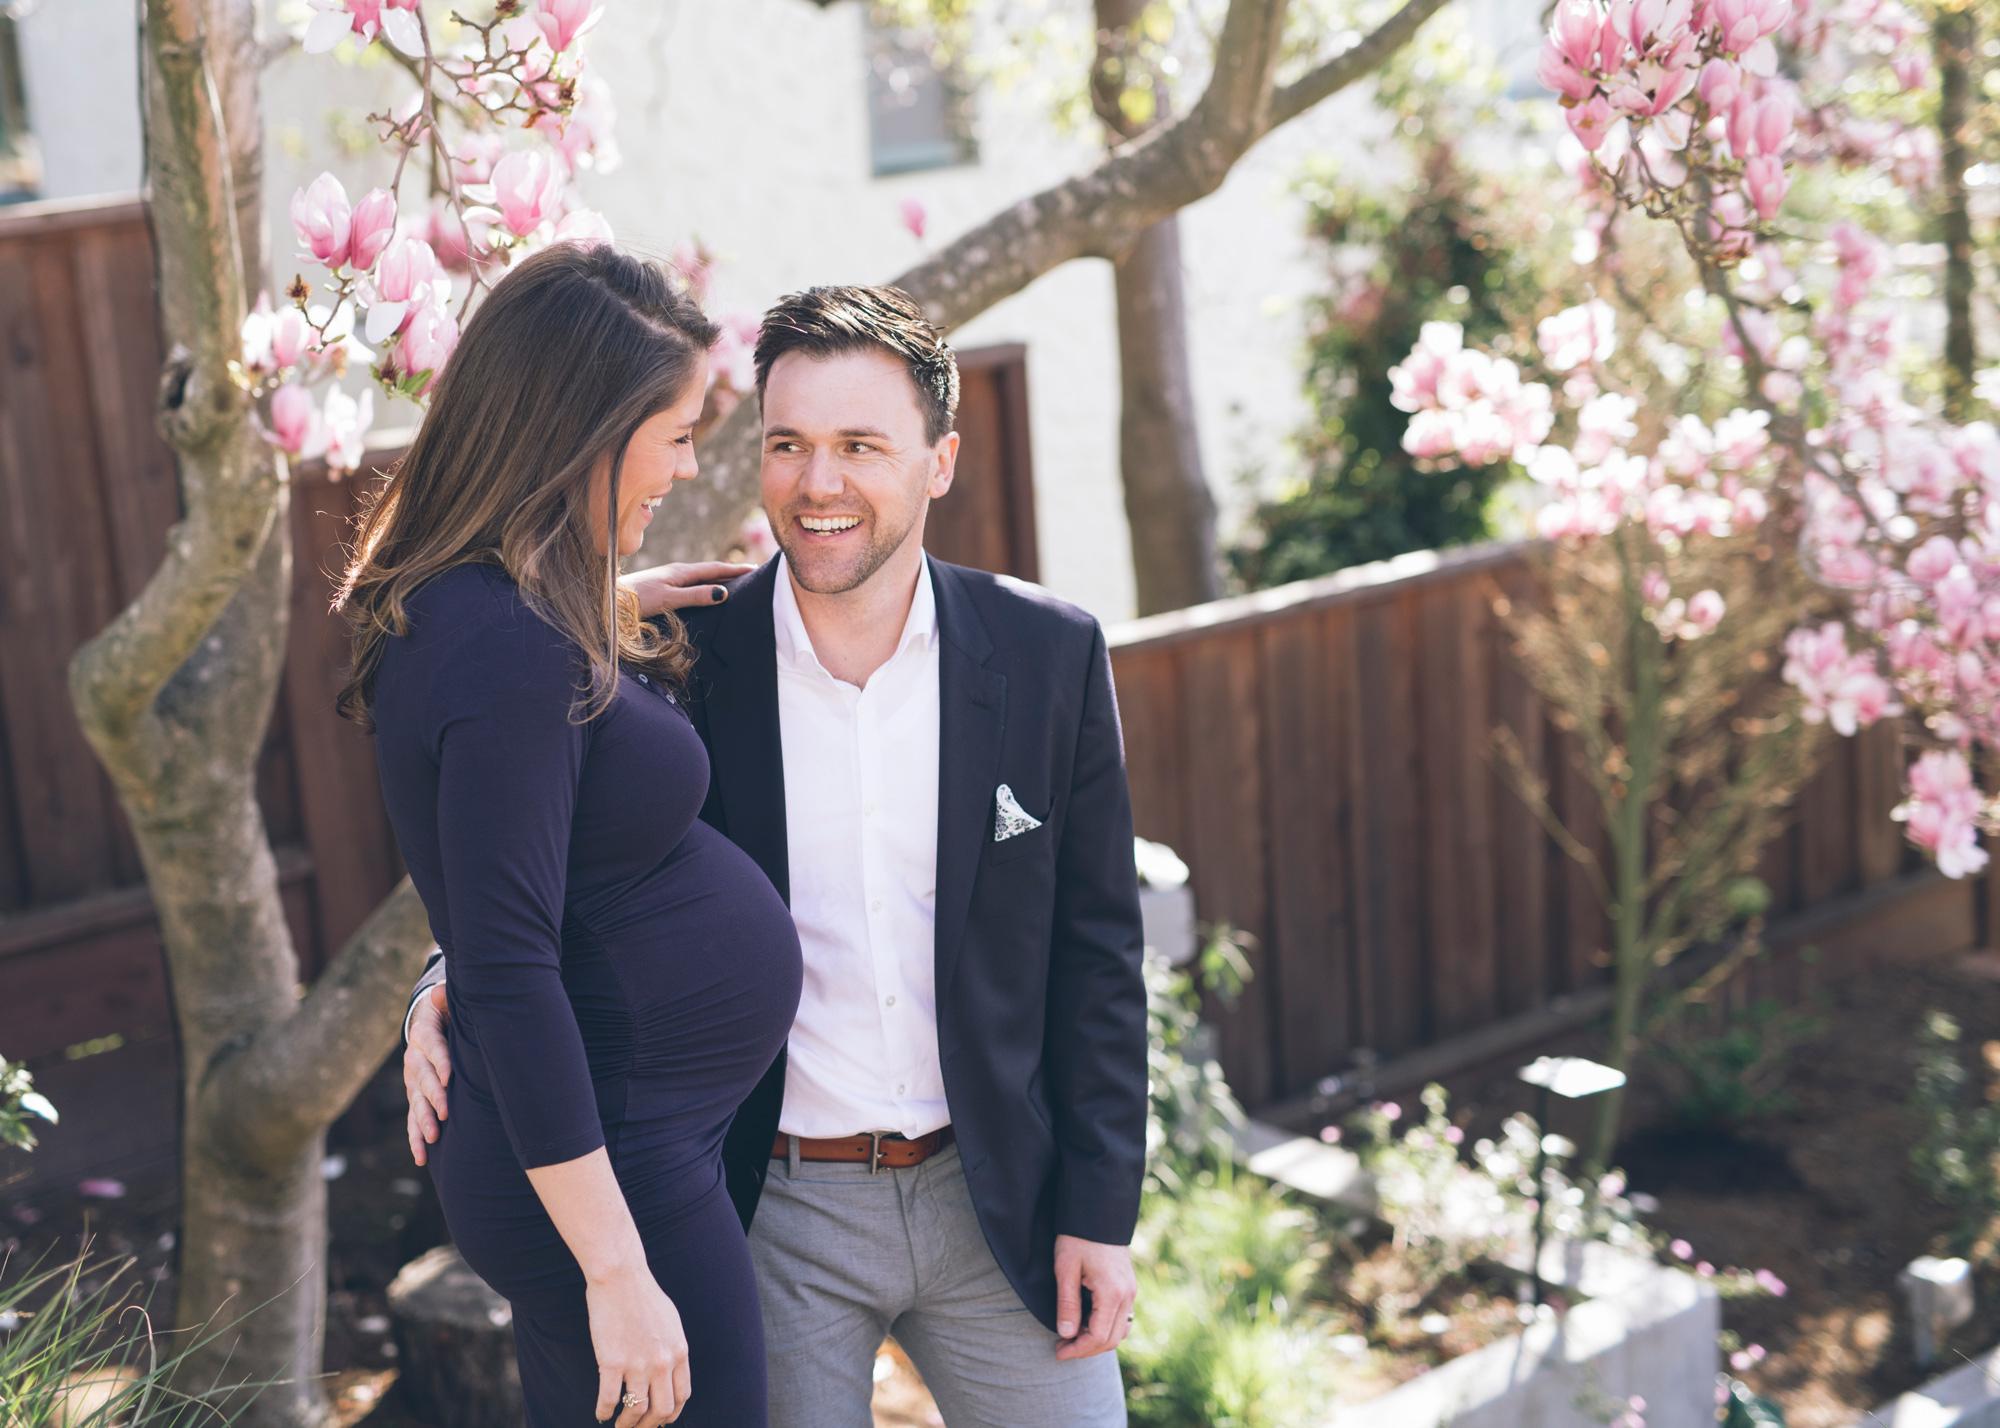 backyard-maternity-photo-of-a-beautiful-expectant-couple.jpg